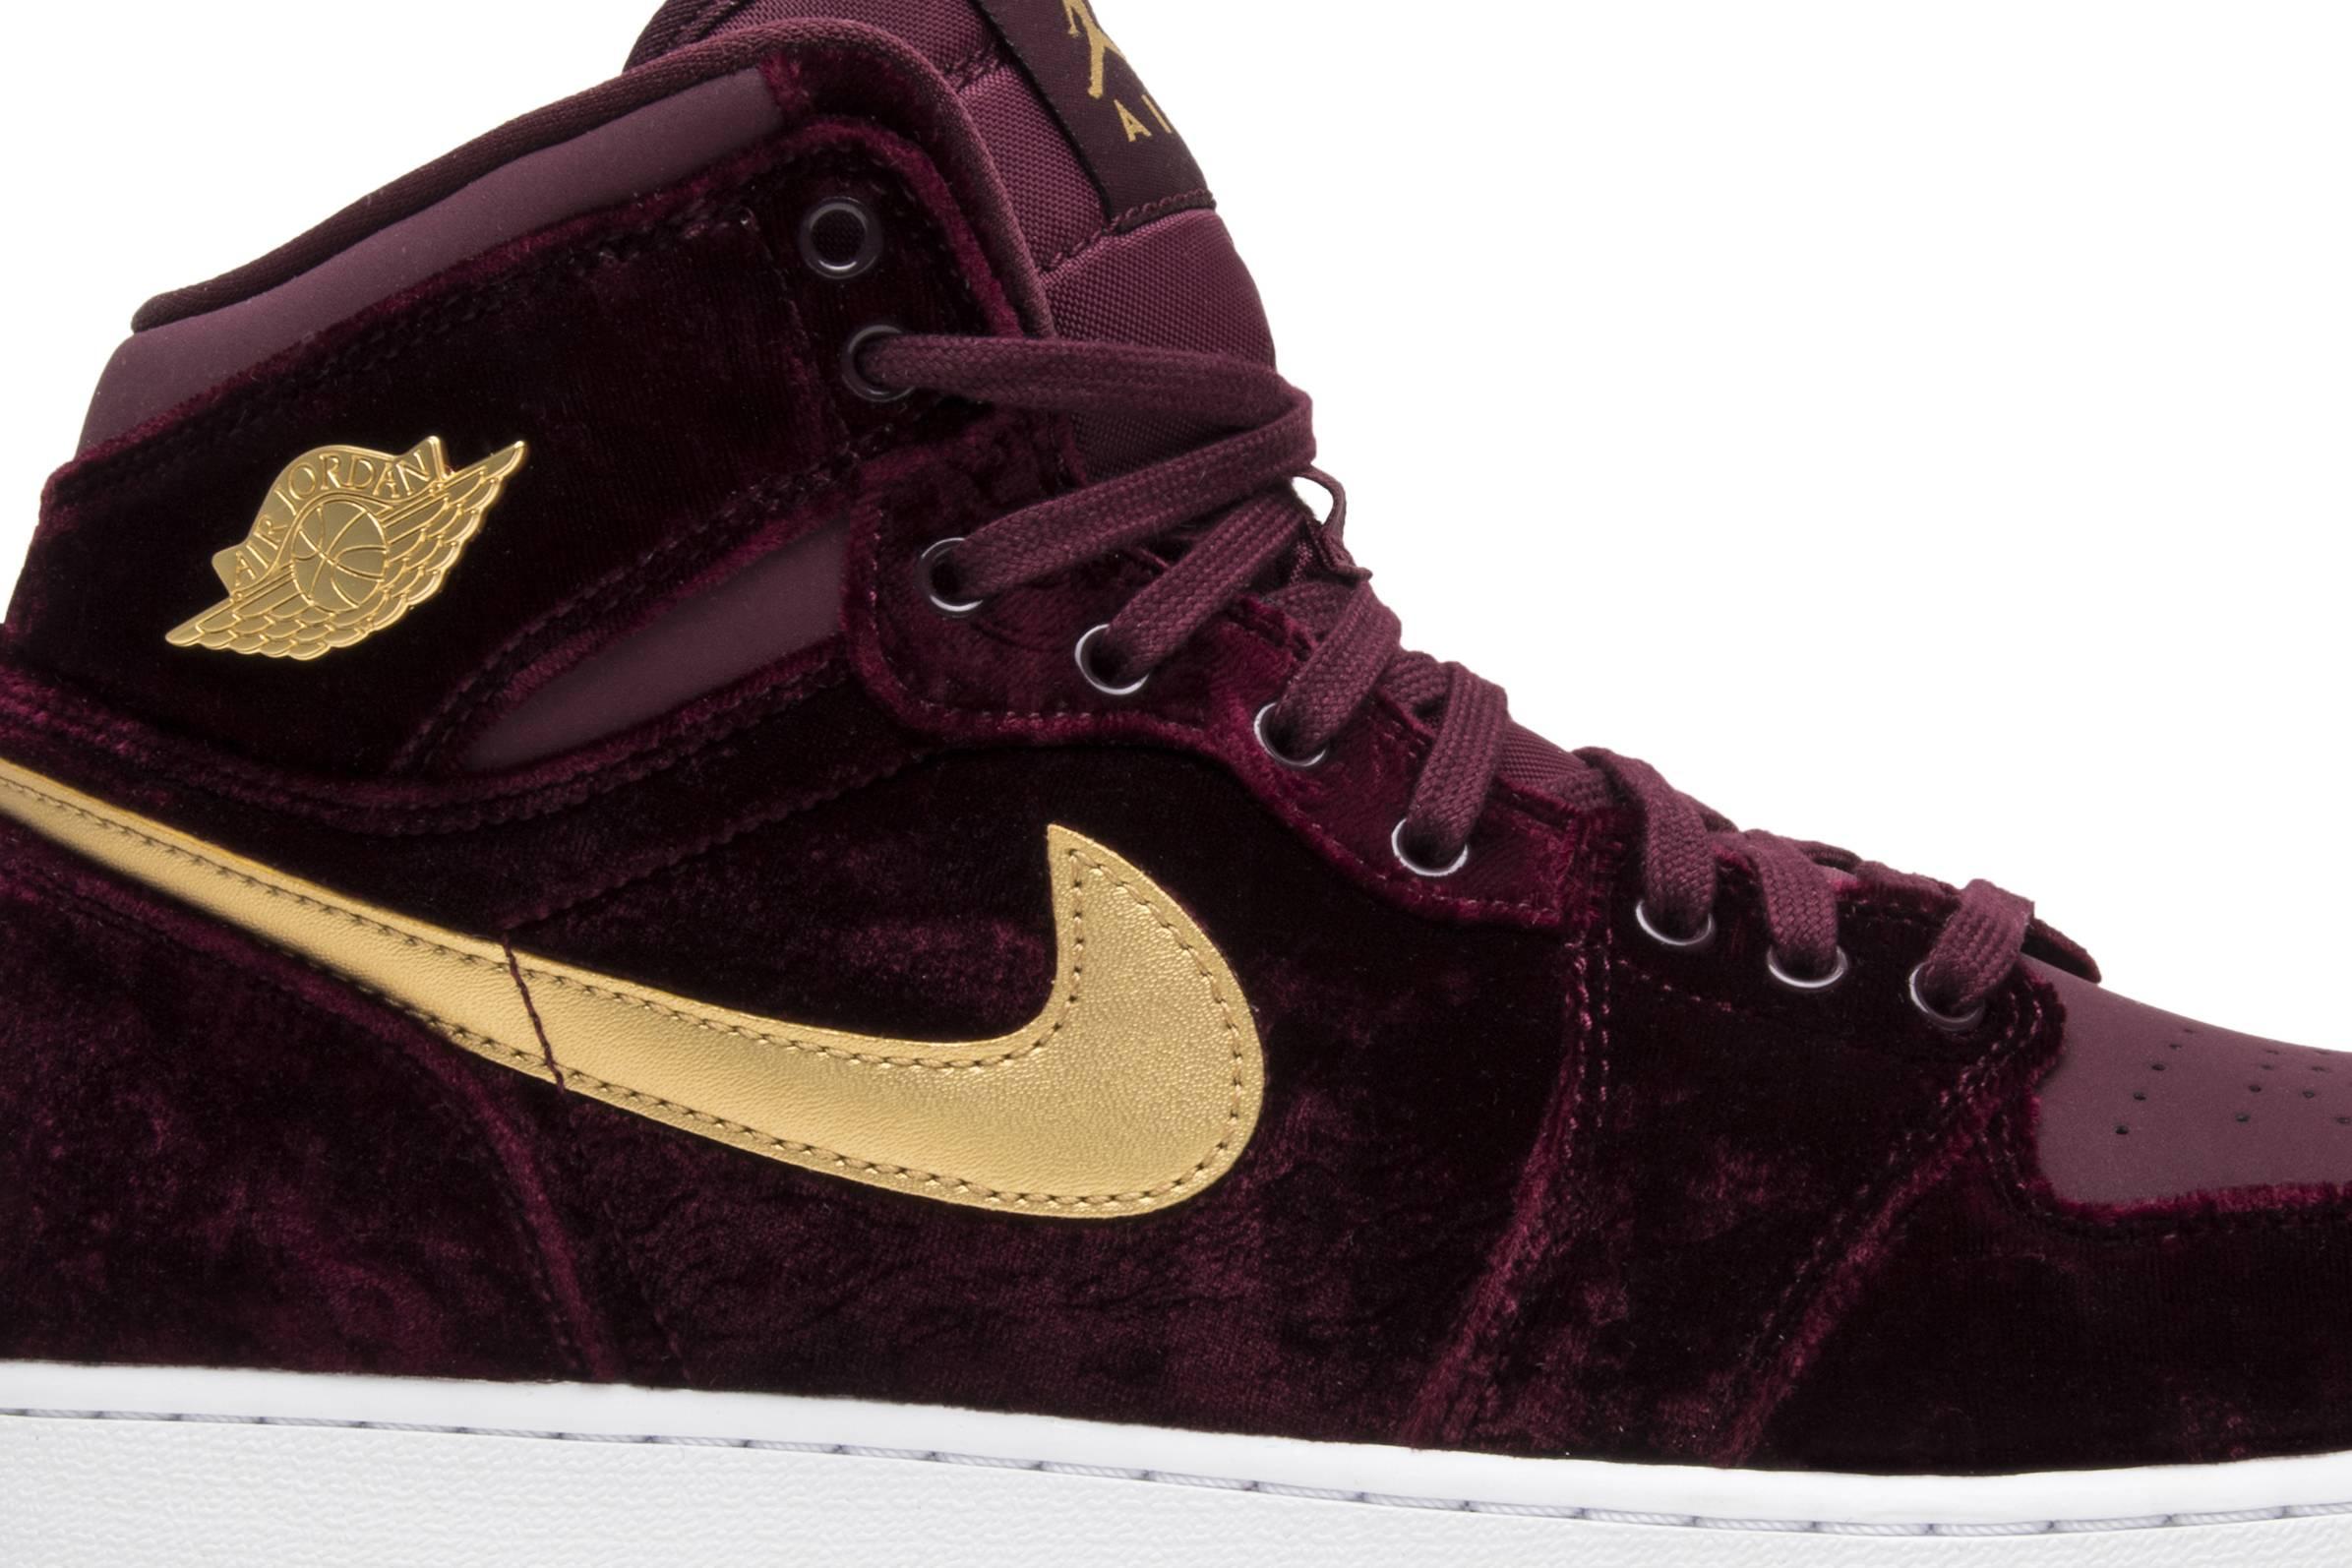 9f20861f3c29 ... 73358 02.jpg.jpeg 1531249220  Nike Air Jordan 1 Retro Velvet Royal Blue  Gold Unisex Shoes 832596 ...